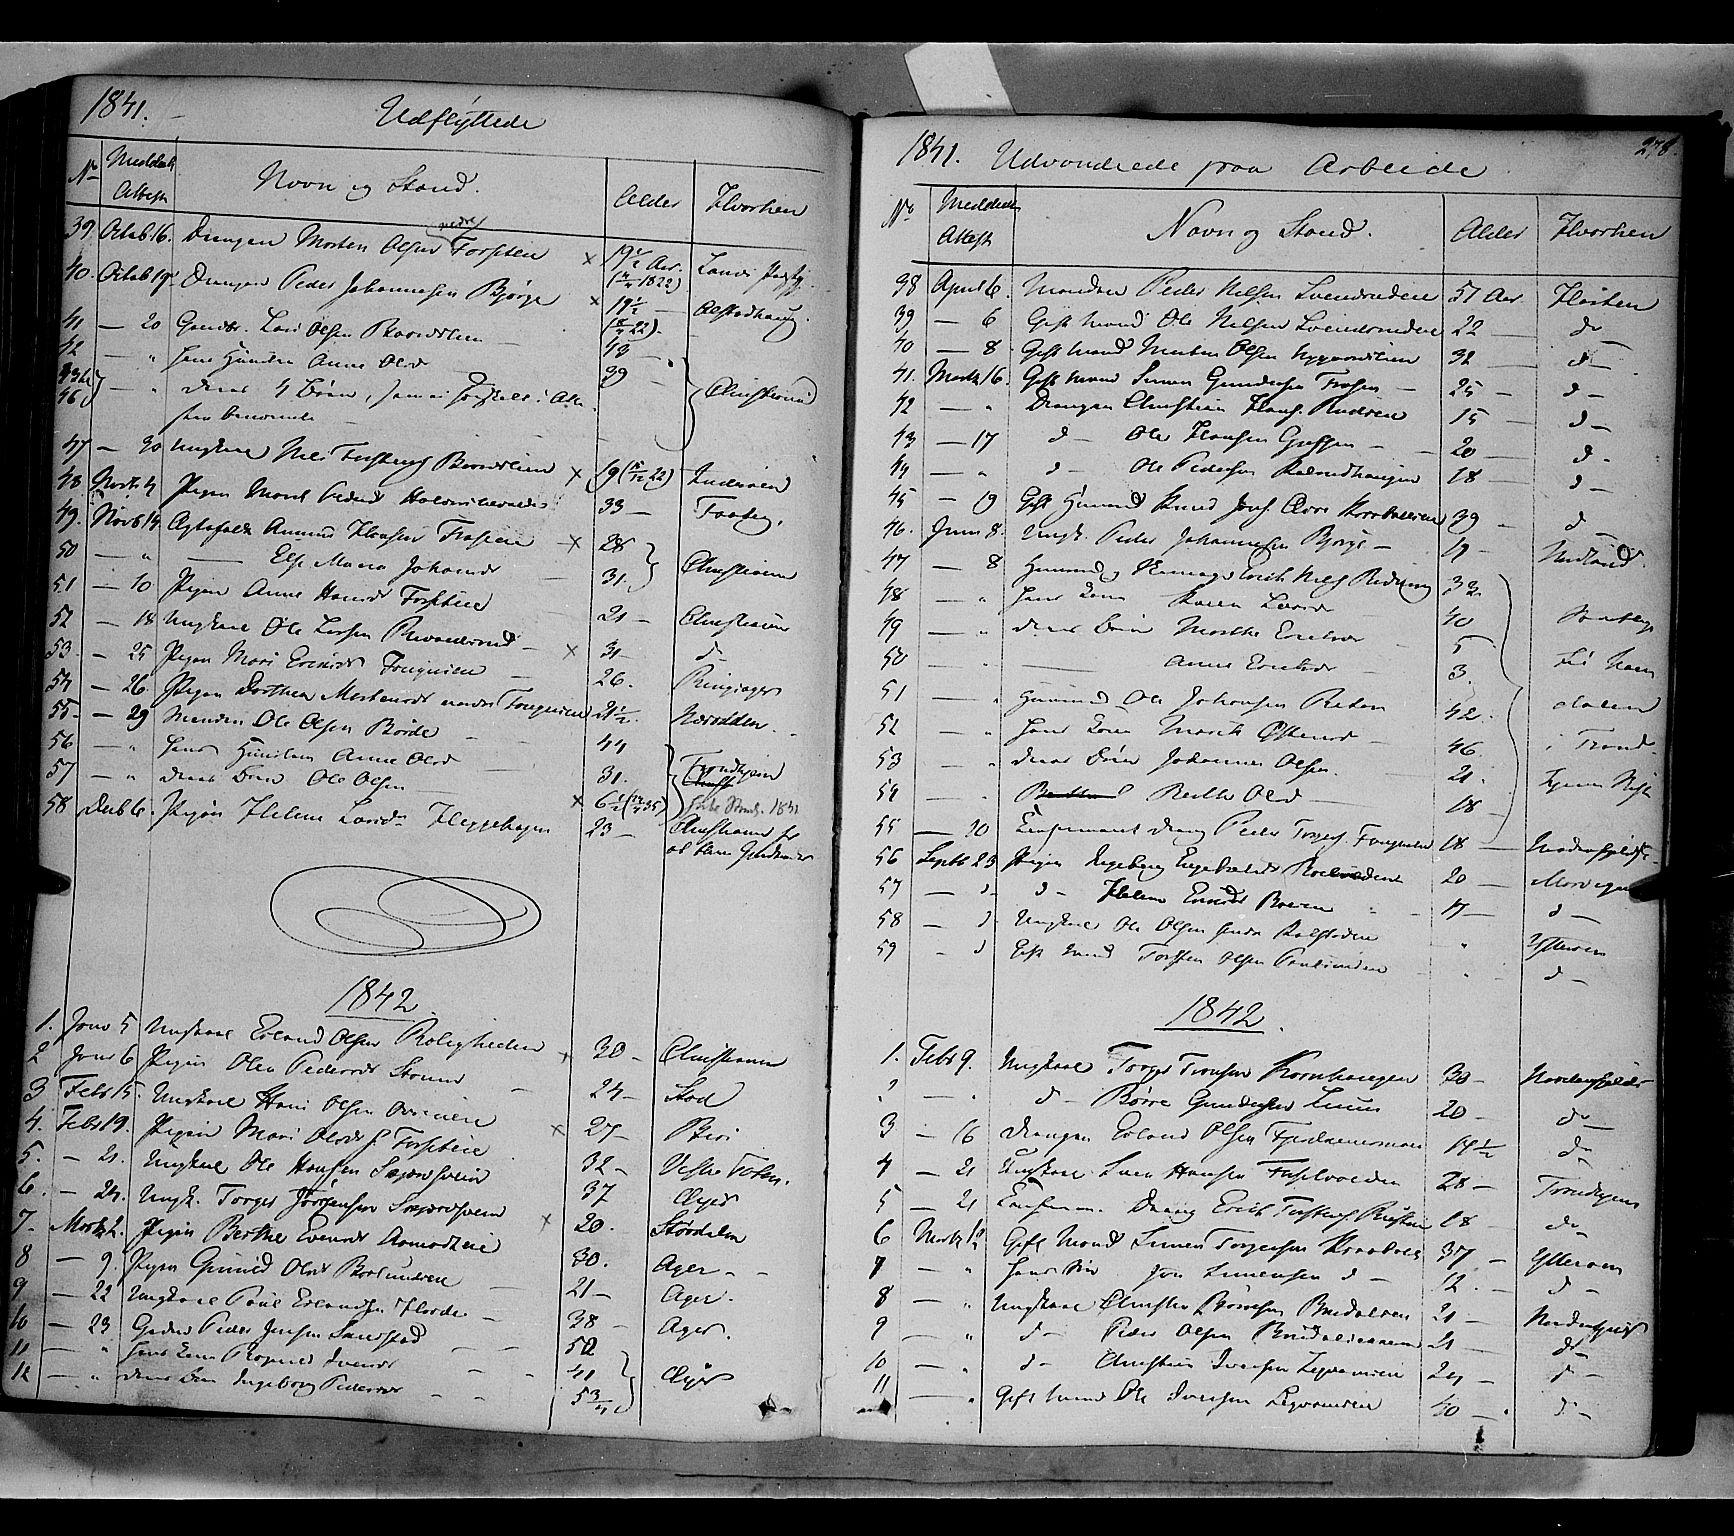 SAH, Gausdal prestekontor, Ministerialbok nr. 7, 1840-1850, s. 278